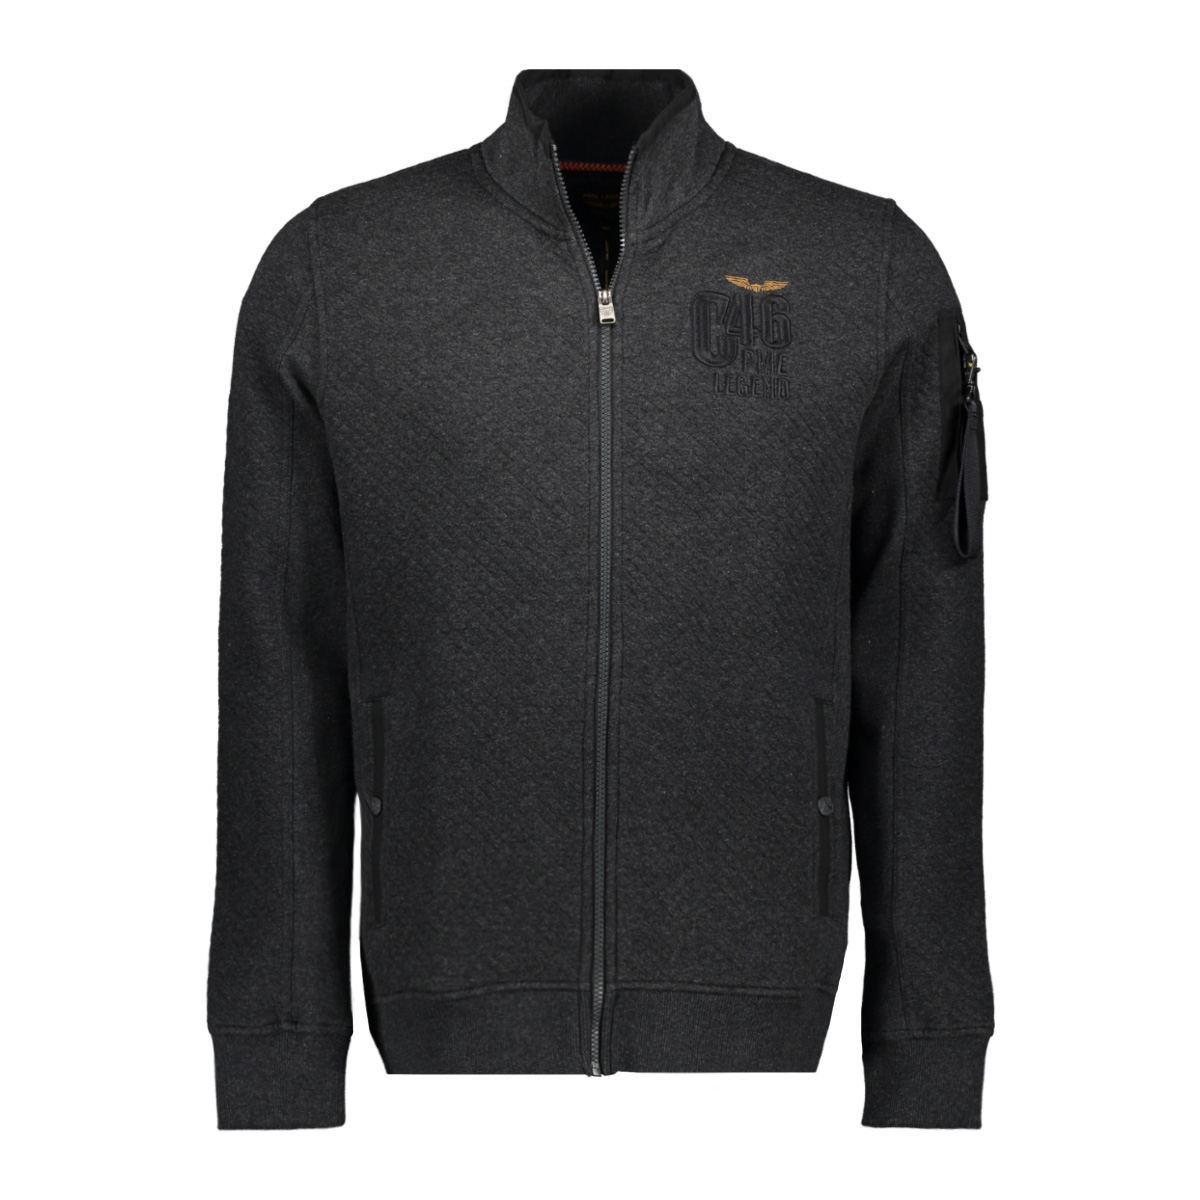 zip sweater psw195404 pme legend vest 9073